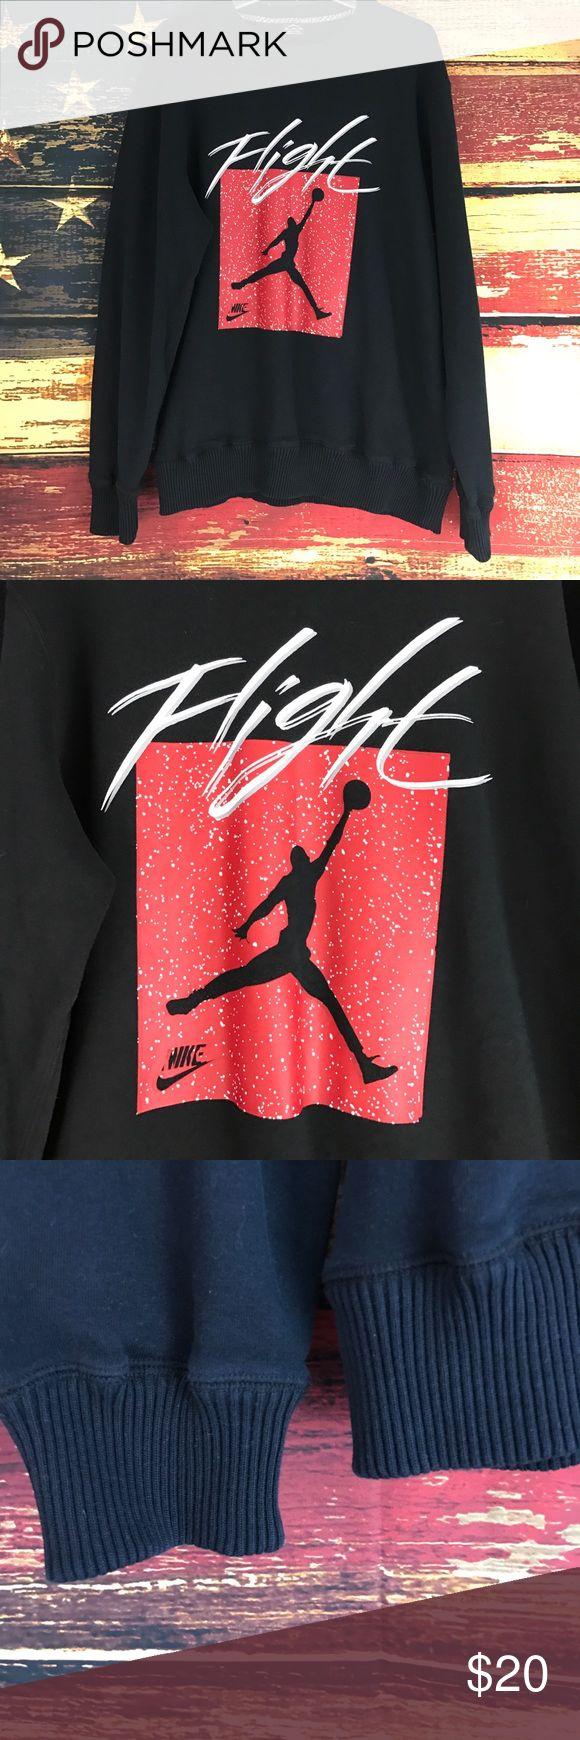 Men's Jordan Black Flight sweatshirt size XL Men's Black Flight Sweatshirt XL Nike Red, Black & white Jordan Sweaters